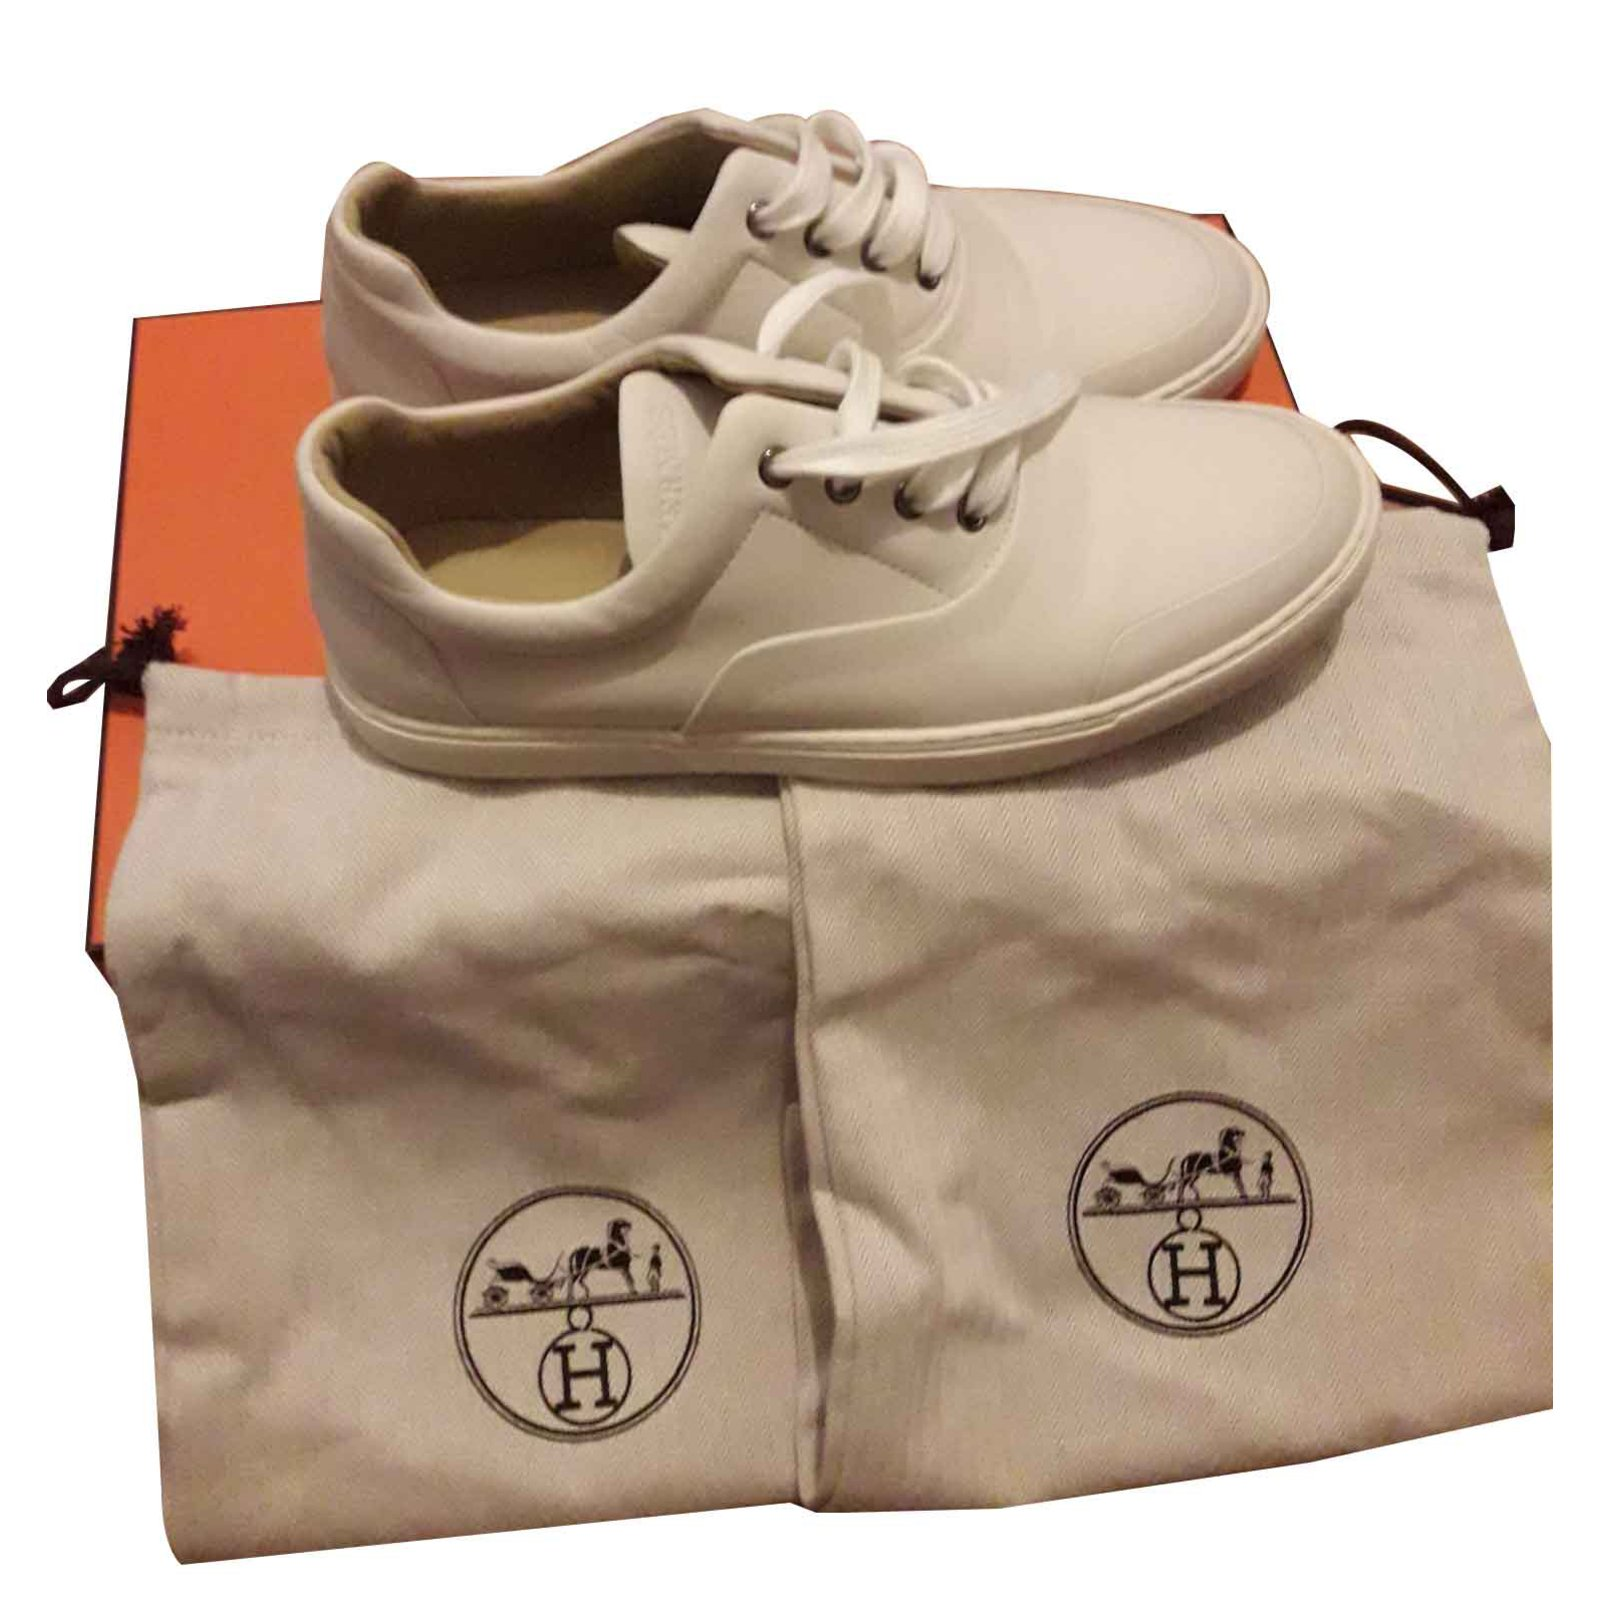 9f3892f176 Baskets homme Hermès HERMES - Chaussures Sneakers Cuir Cuir Blanc cassé  ref.102479